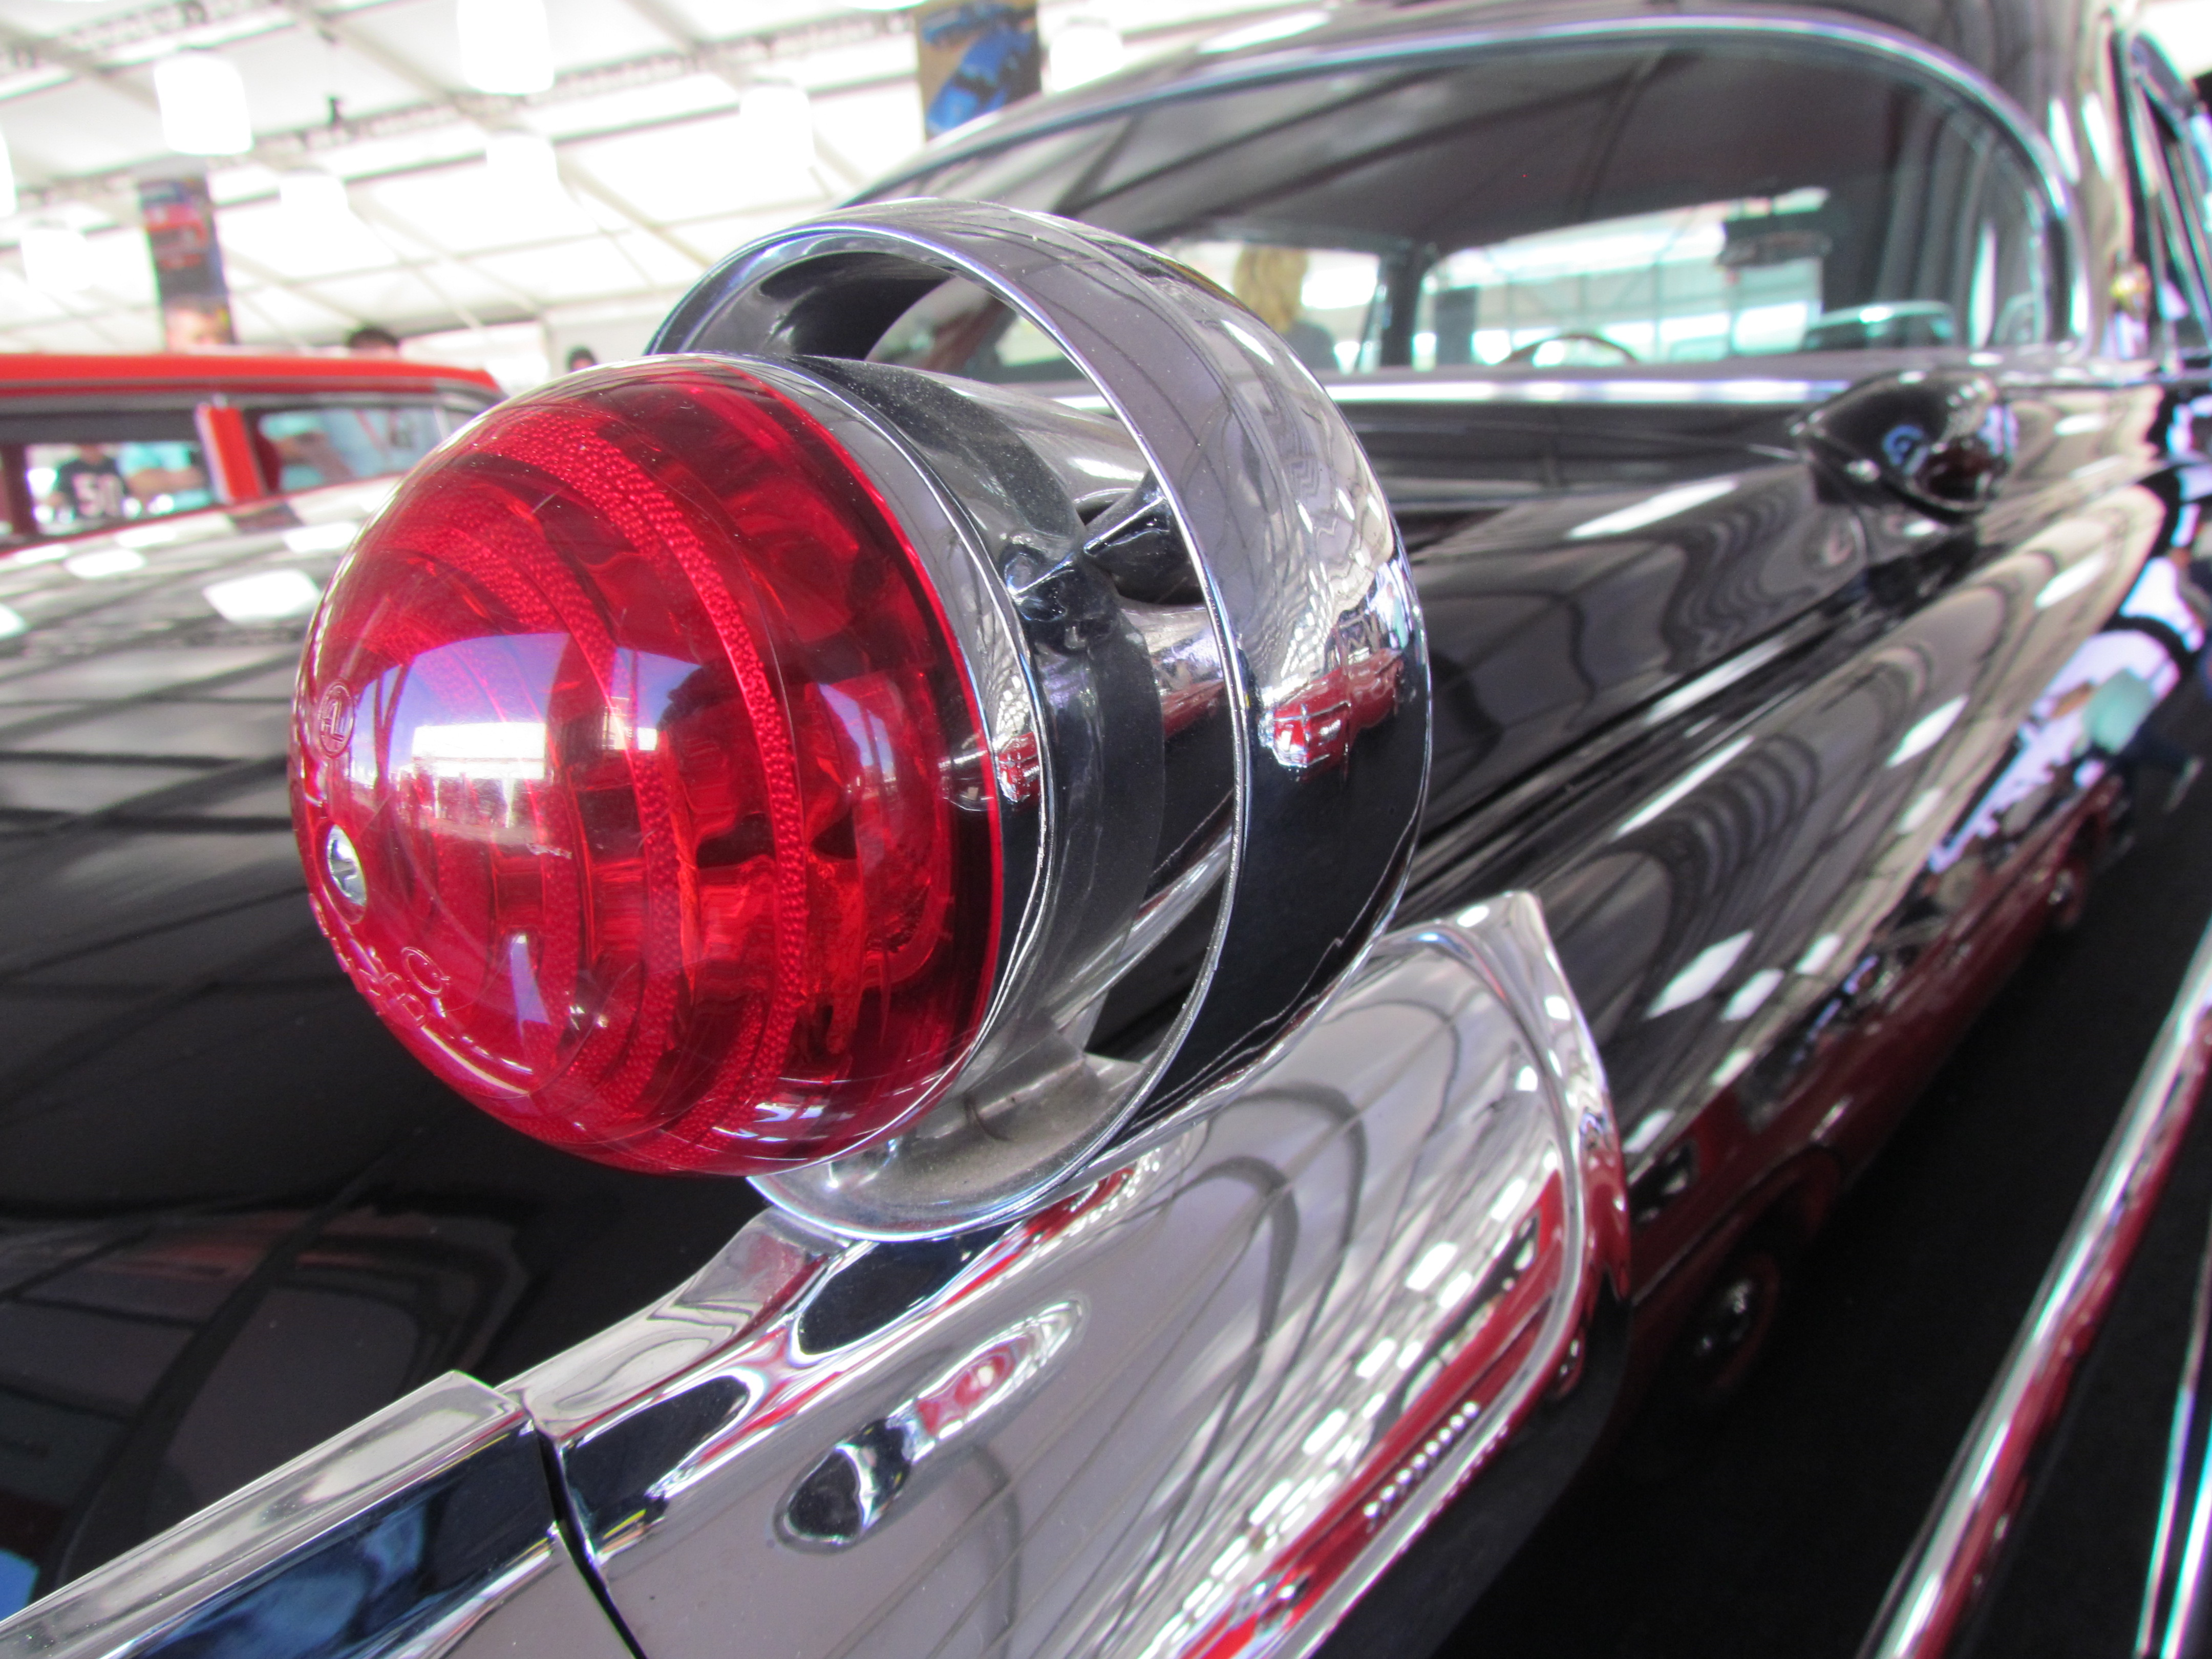 Mecum, Mecum memories: Kissimmee auction ends today, ClassicCars.com Journal